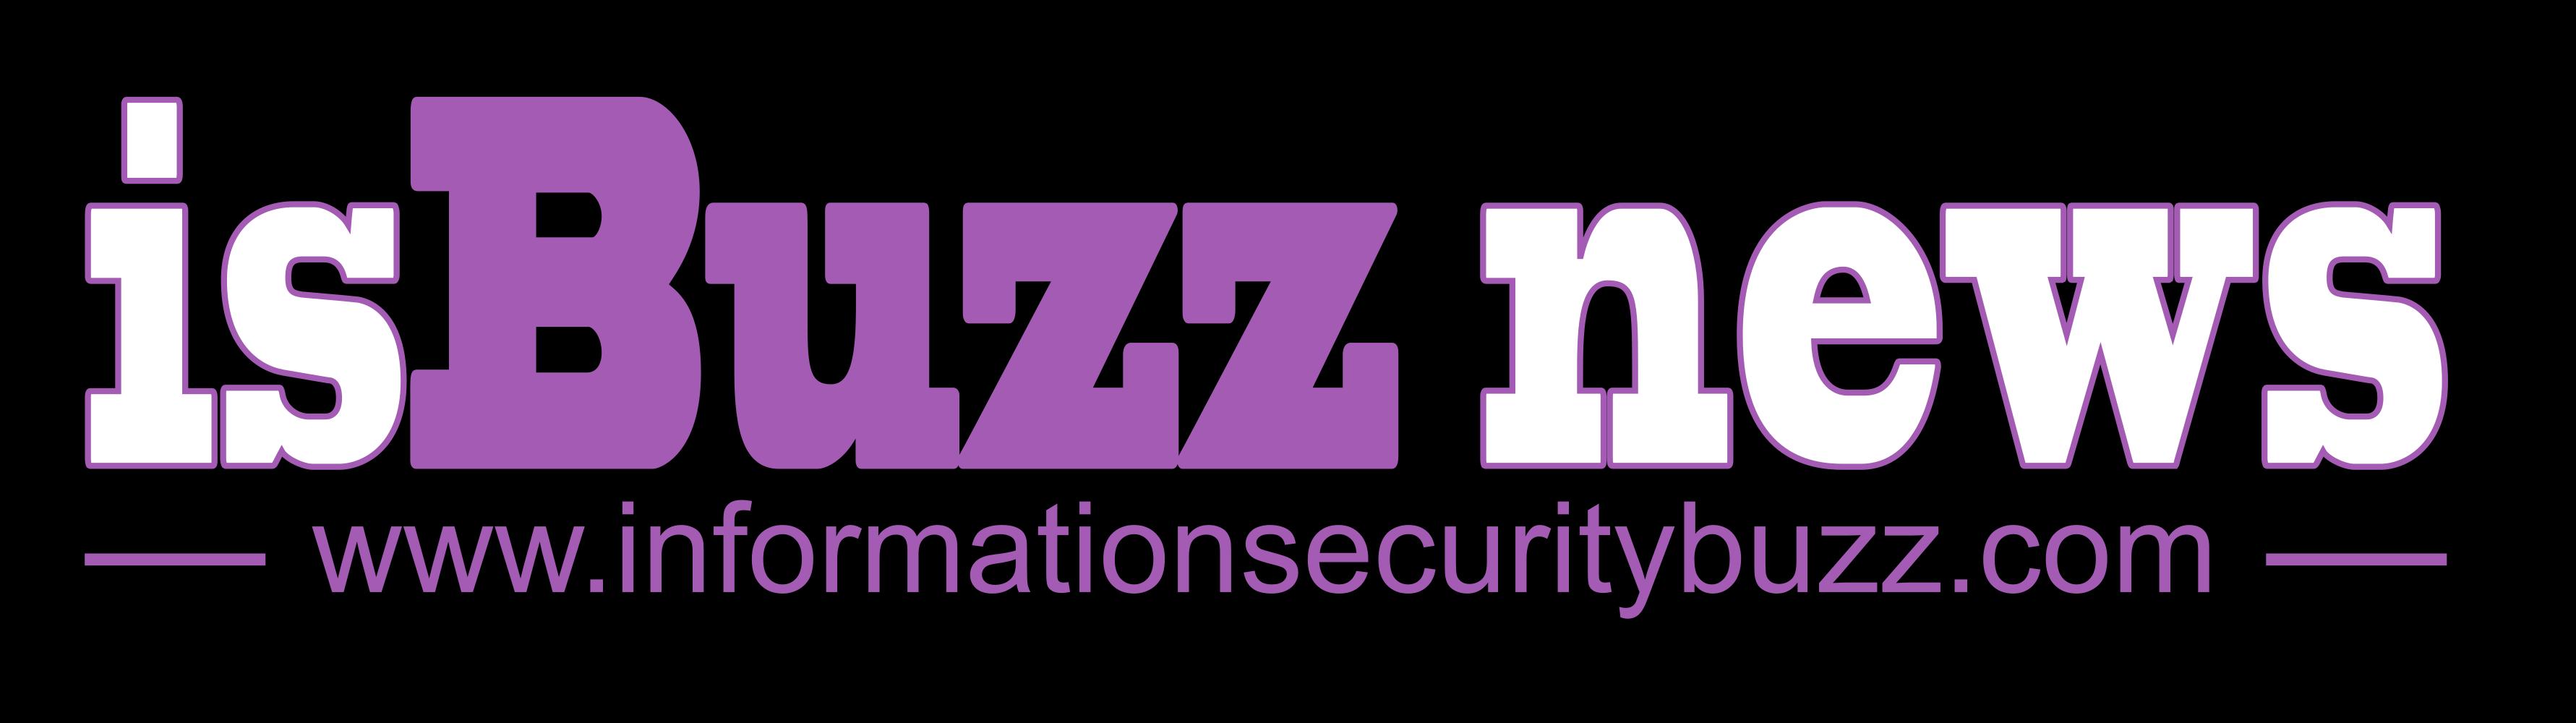 informationsecuritybuzz